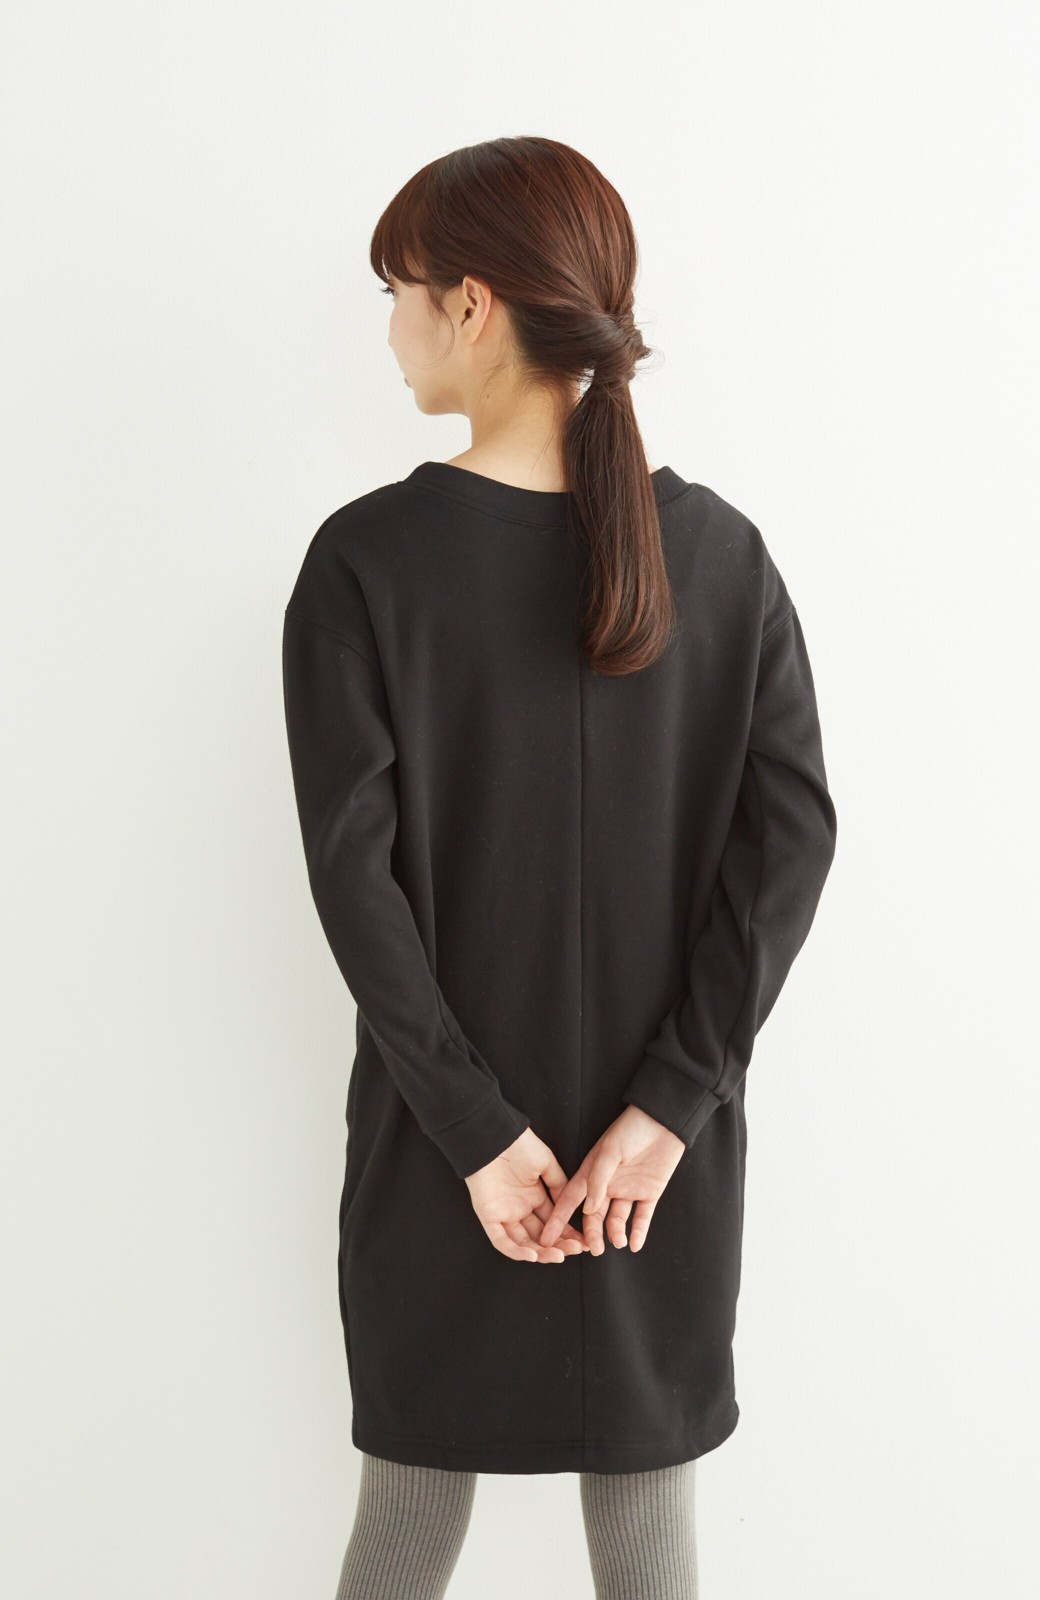 nusy 裏シャギー起毛のブランケットワンピース <ブラック>の商品写真10